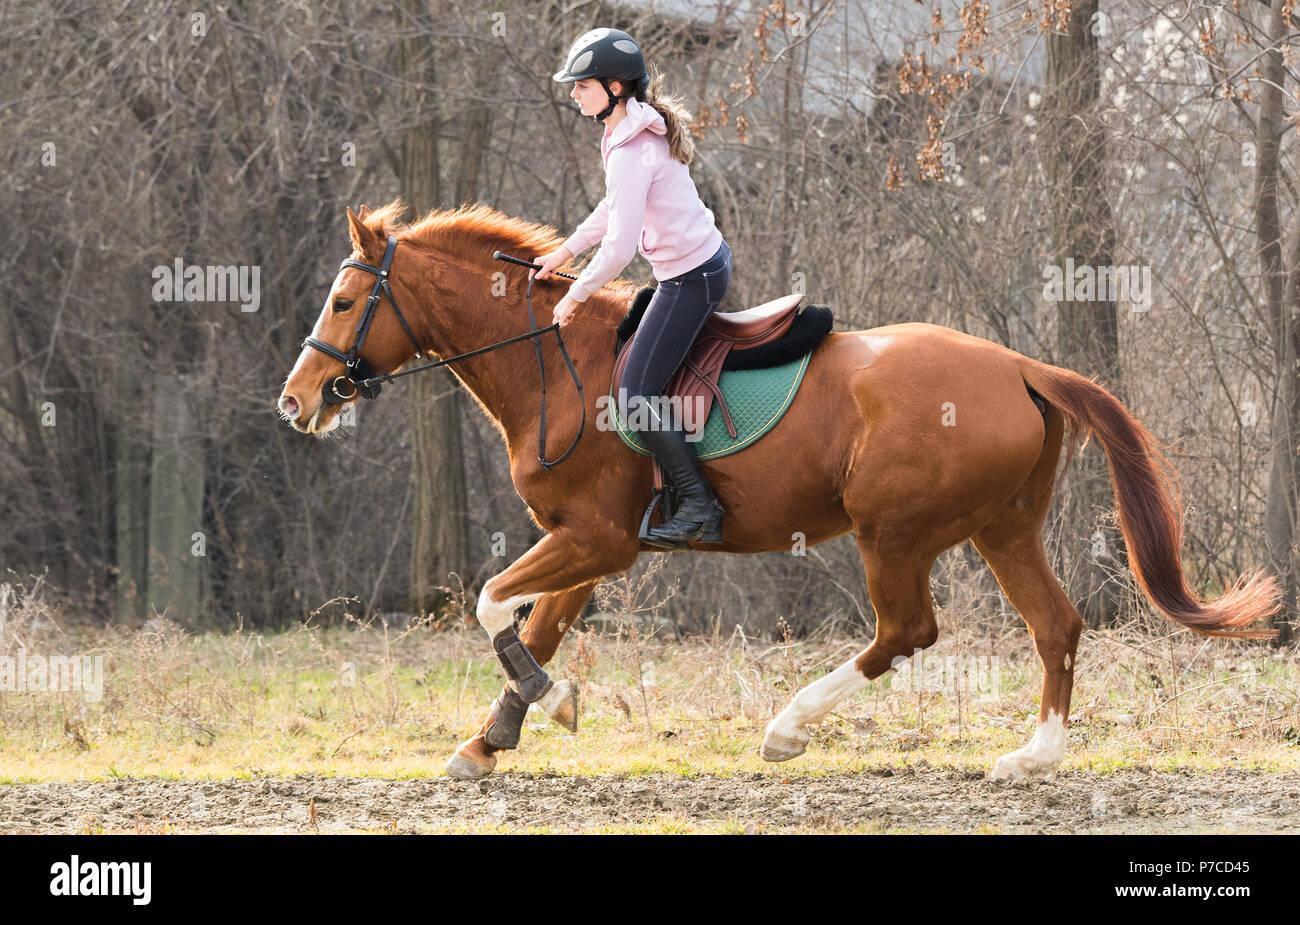 Chica guapa joven a caballo Foto de stock